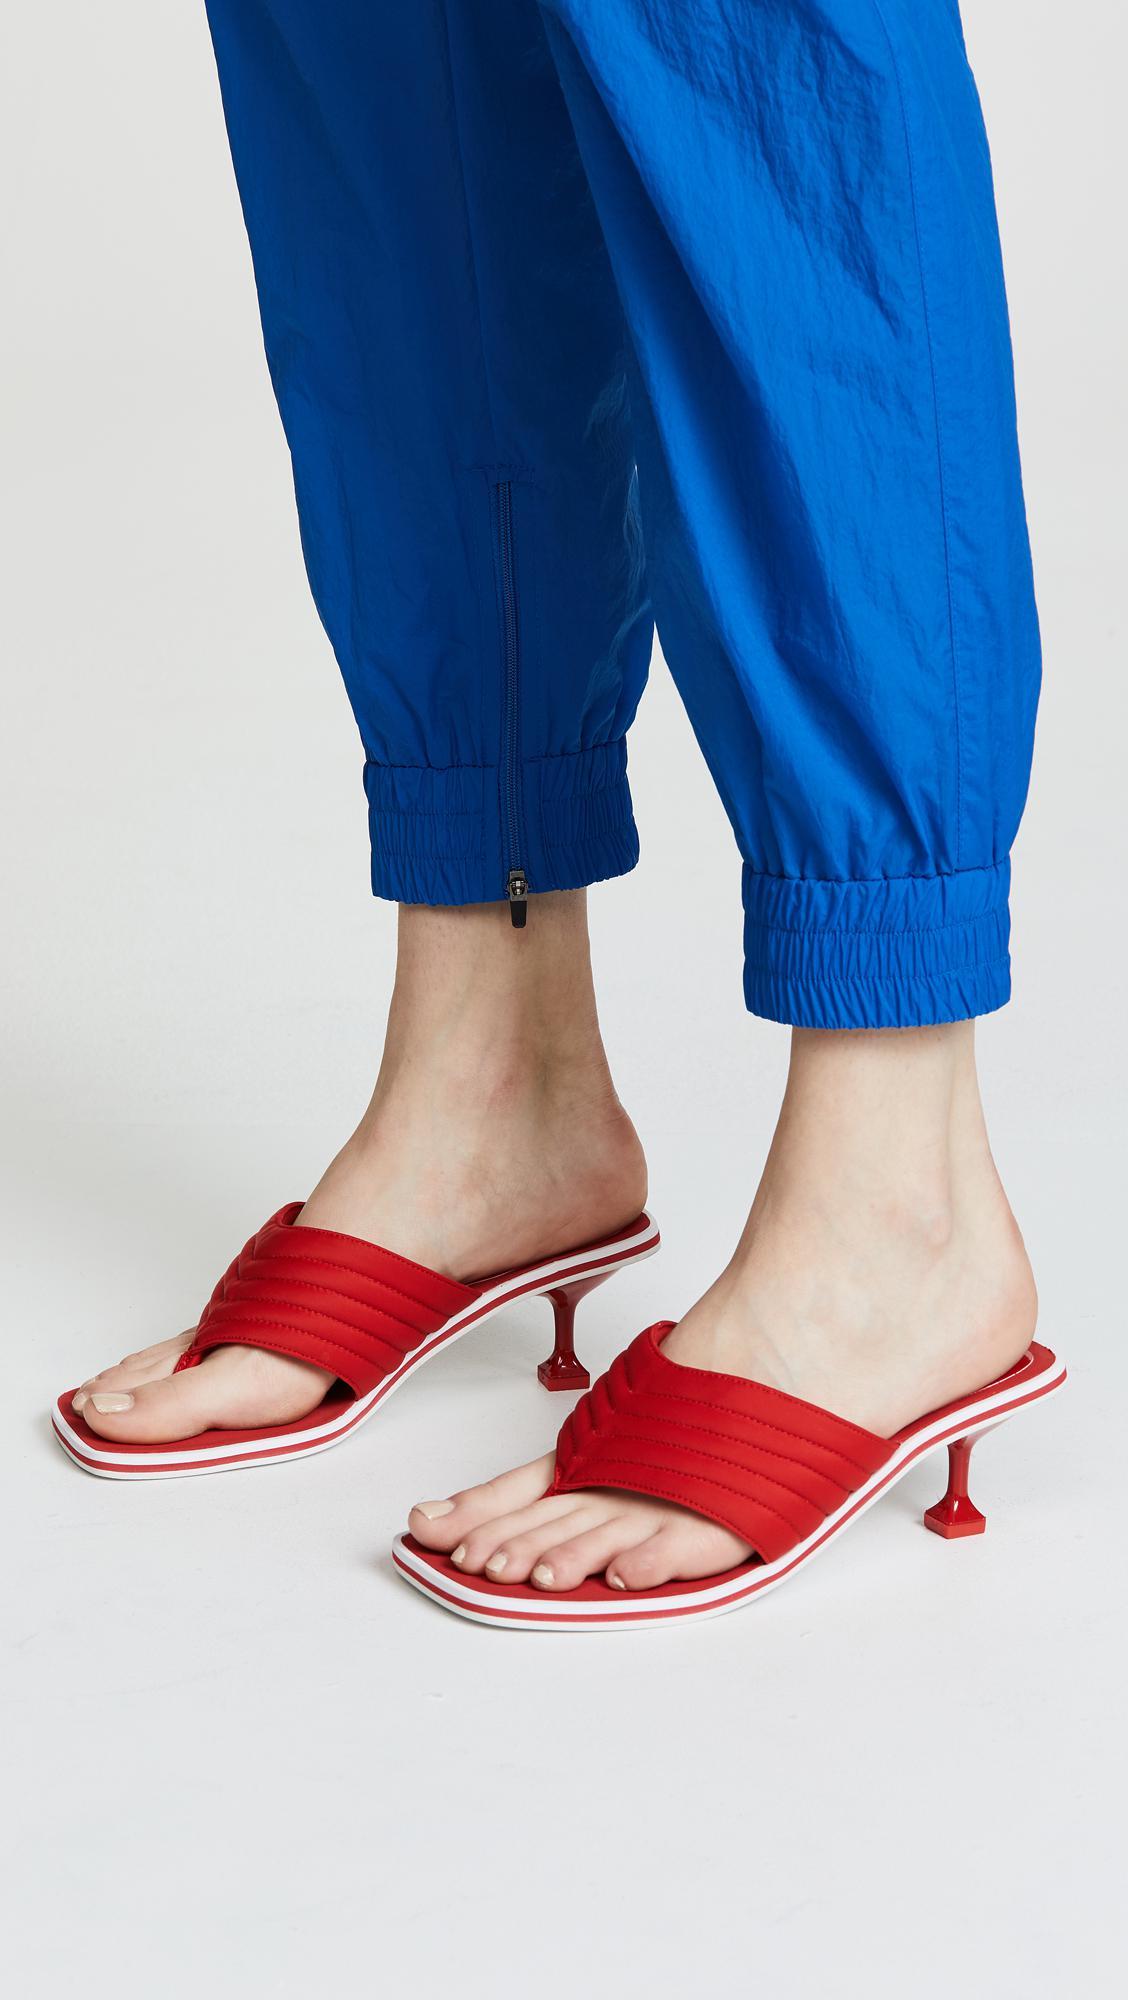 7f084f97bceae Lyst - Jeffrey Campbell Overtime Kitten Heel Flip Flops in Red